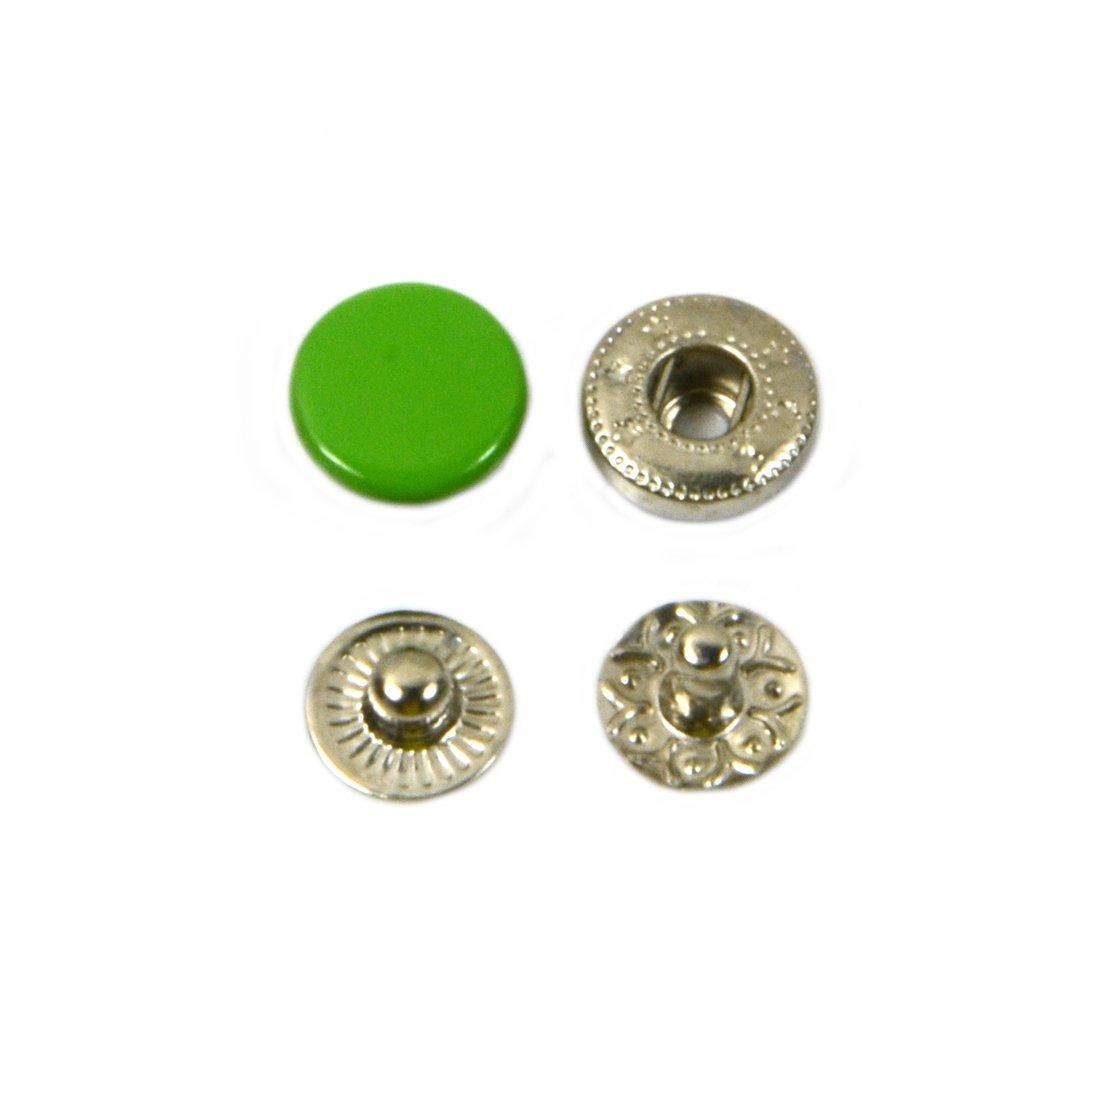 AngelaKerry メタル ジャンパーホック 10mm 緑 1000個セット [並行輸入品] 1000個 緑 B01KZCANRC